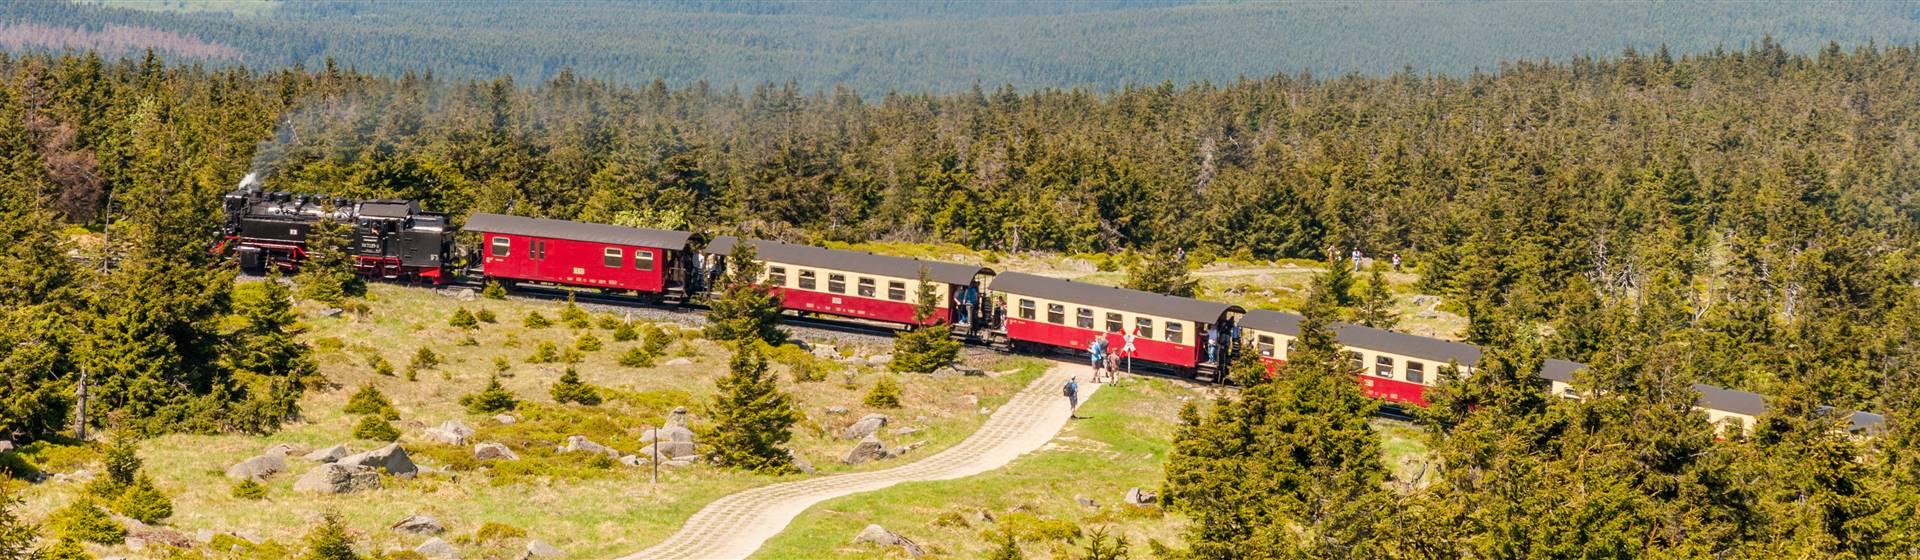 "<img src=""harz_train©shutterstock.jpeg"" alt=""HSB on the Brocken""/>"